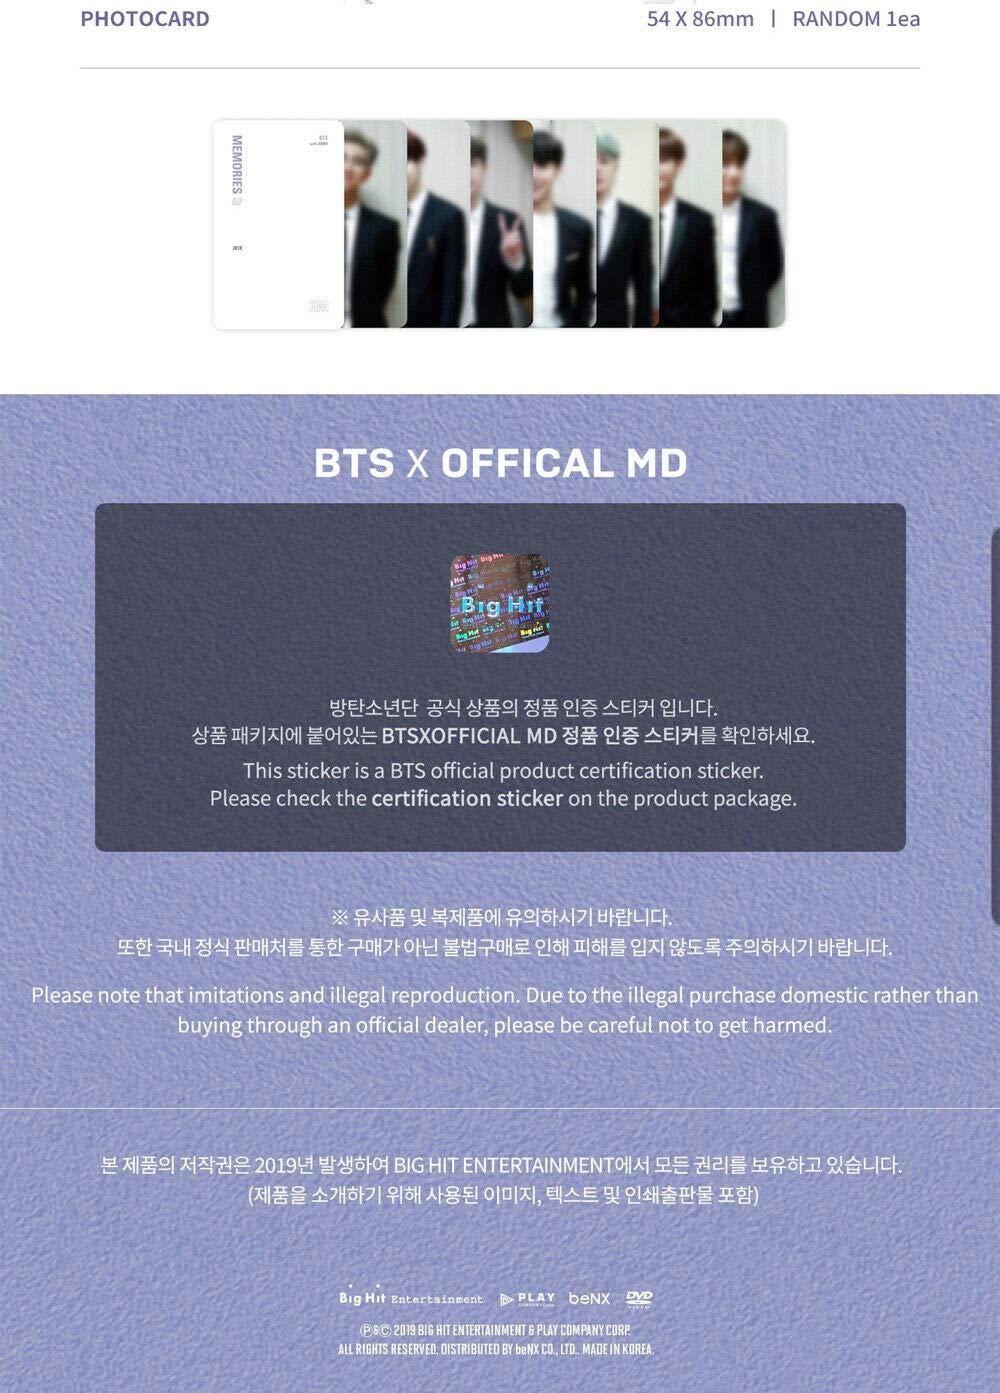 Bangtan Boys - BTS Memories of 2018 DVD 4Discs + BIGHIT Store Pre-Order Benefit + Extra Photocards Set